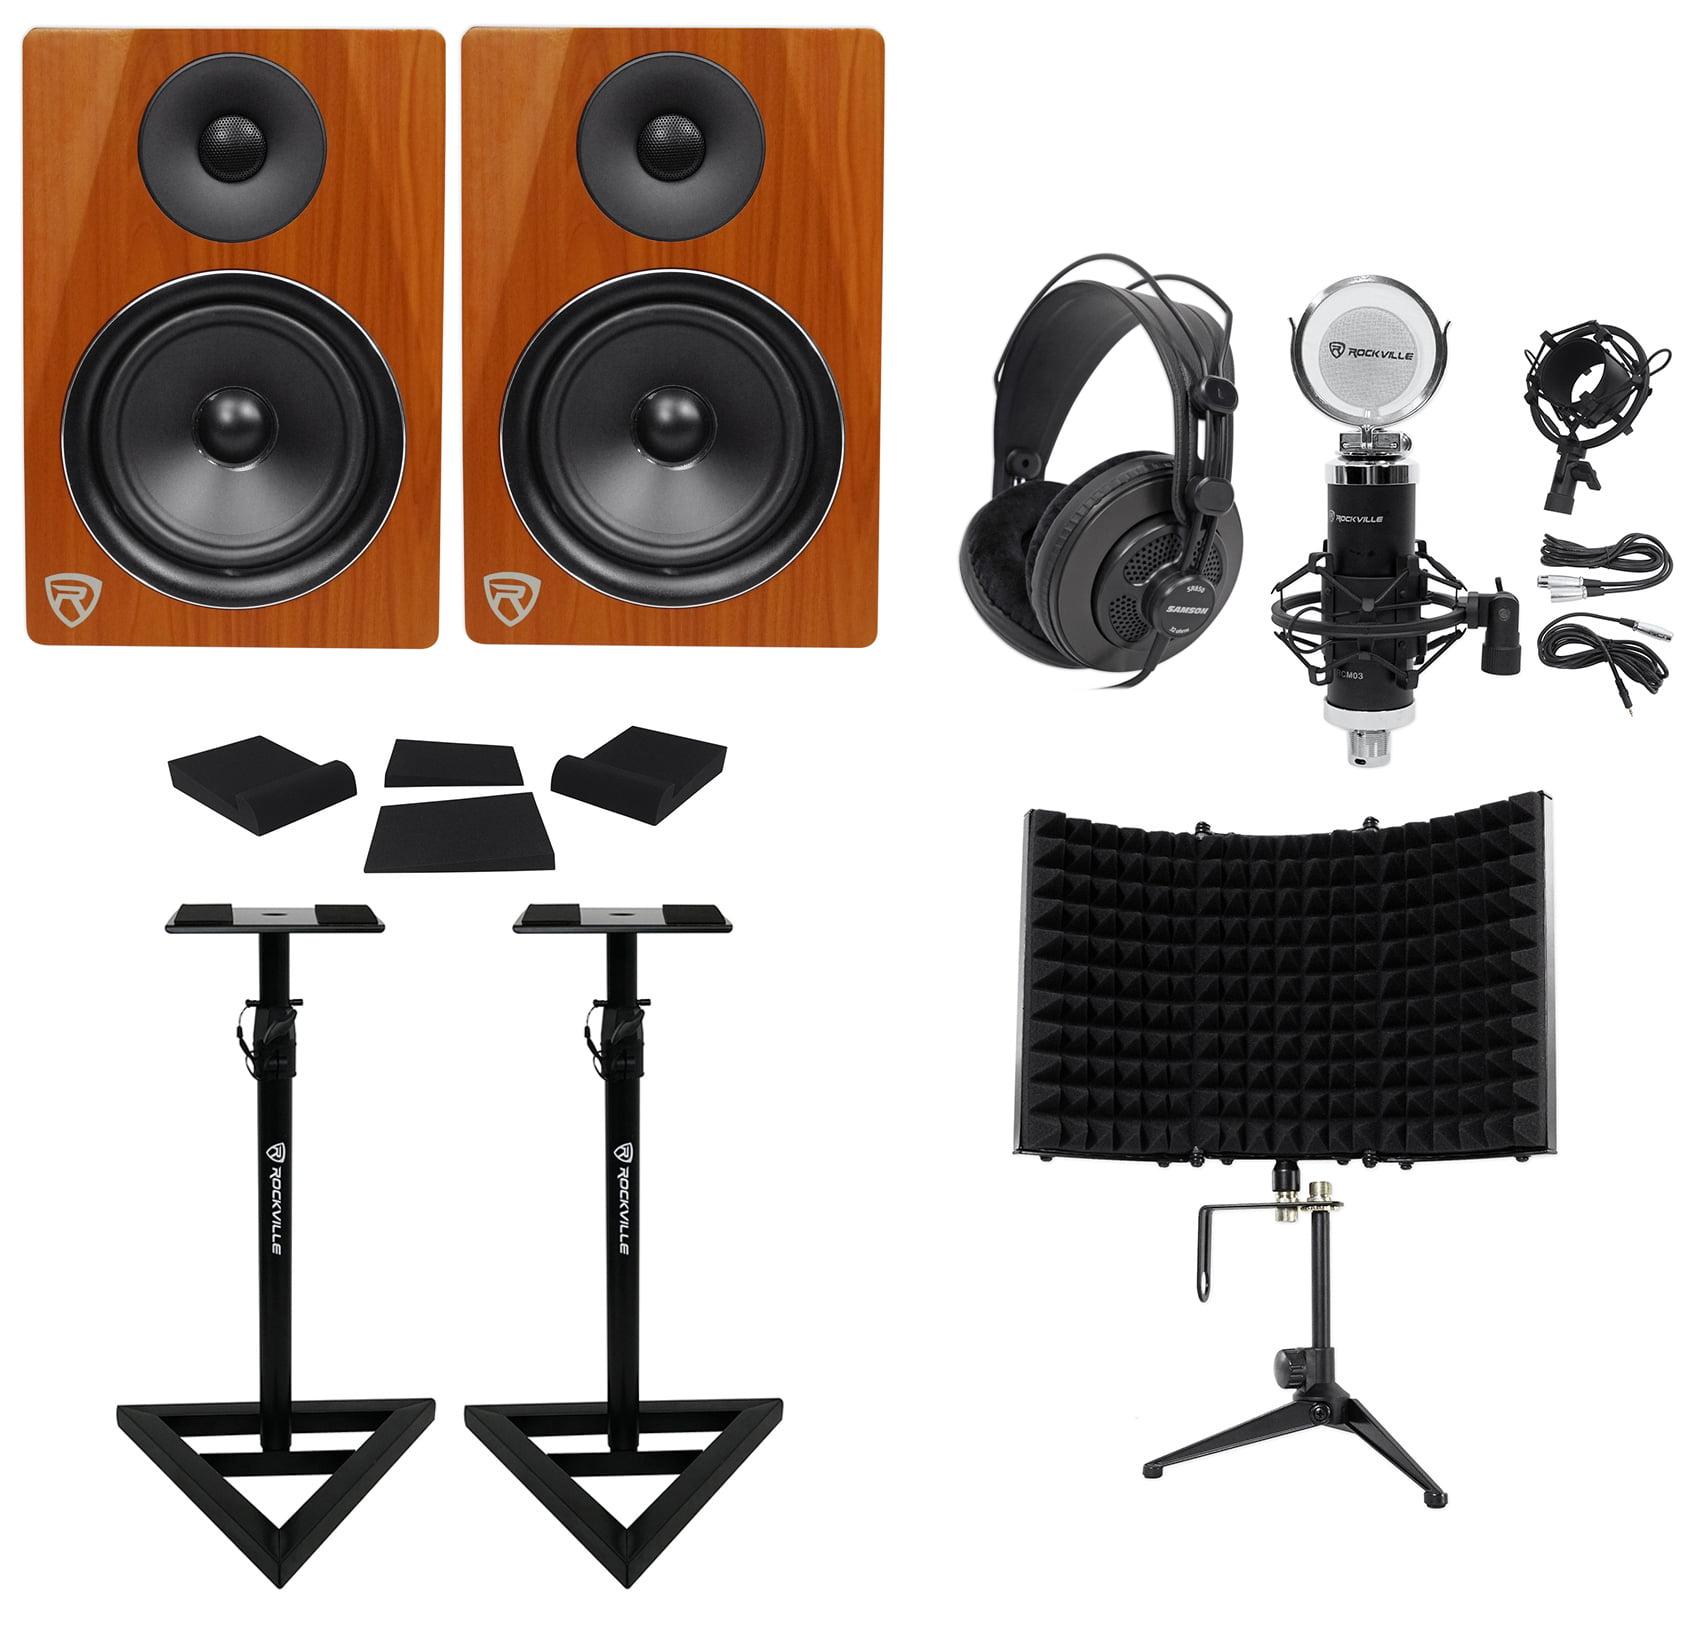 "2) Rockville DPM6C 6.5"" 420w Active Studio Monitors+Stands+Headphones+Mic+Shield by ROCKVILLE"